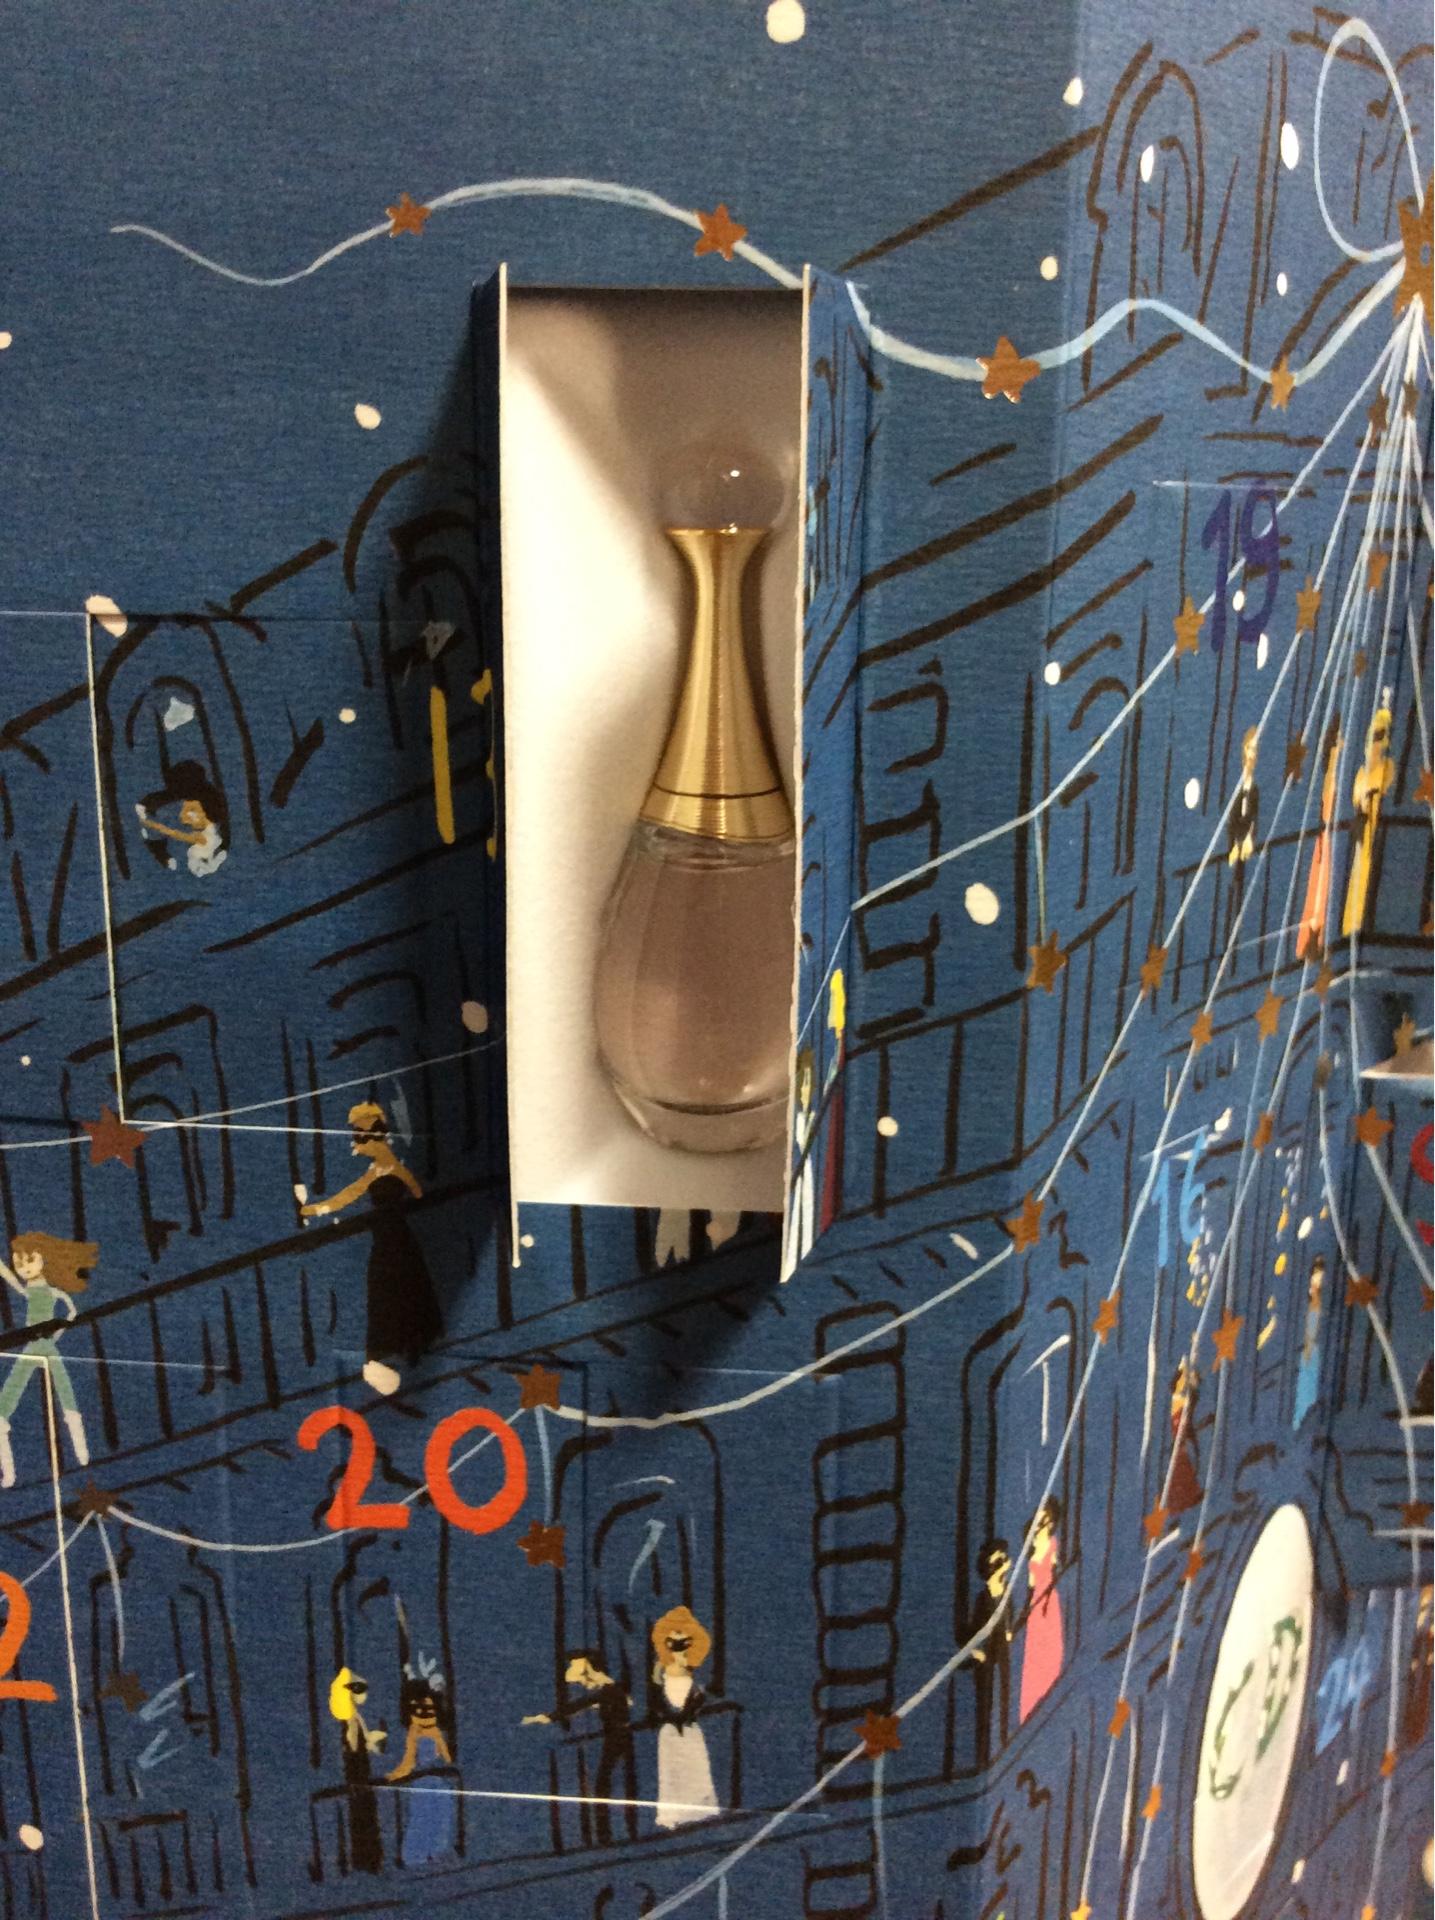 Dior アドベントカレンダー 13日目 ジャドール